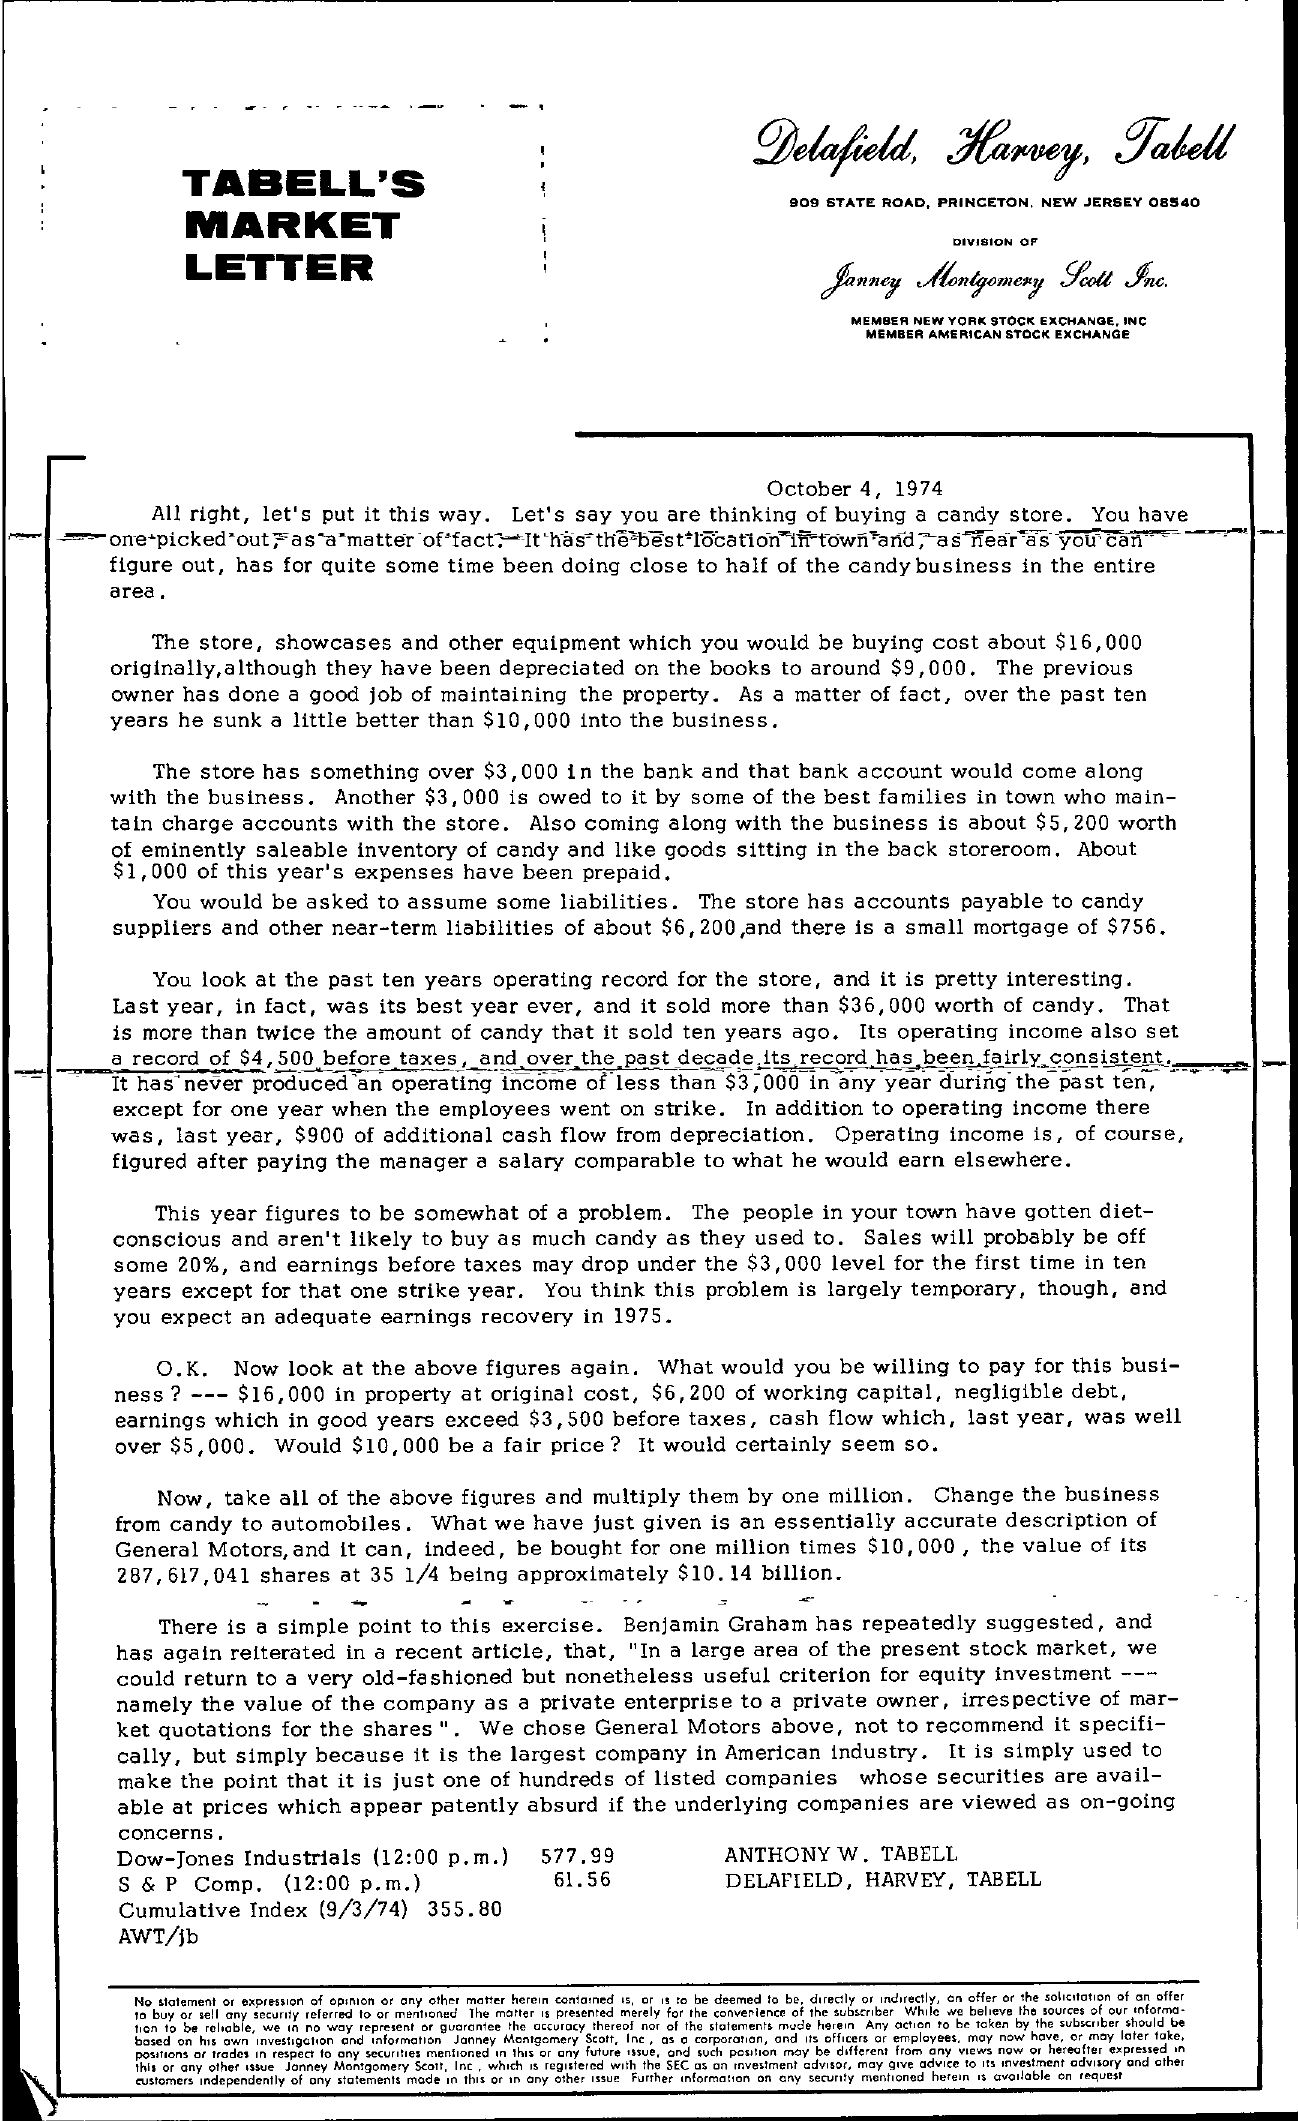 Tabell's Market Letter - October 04, 1974